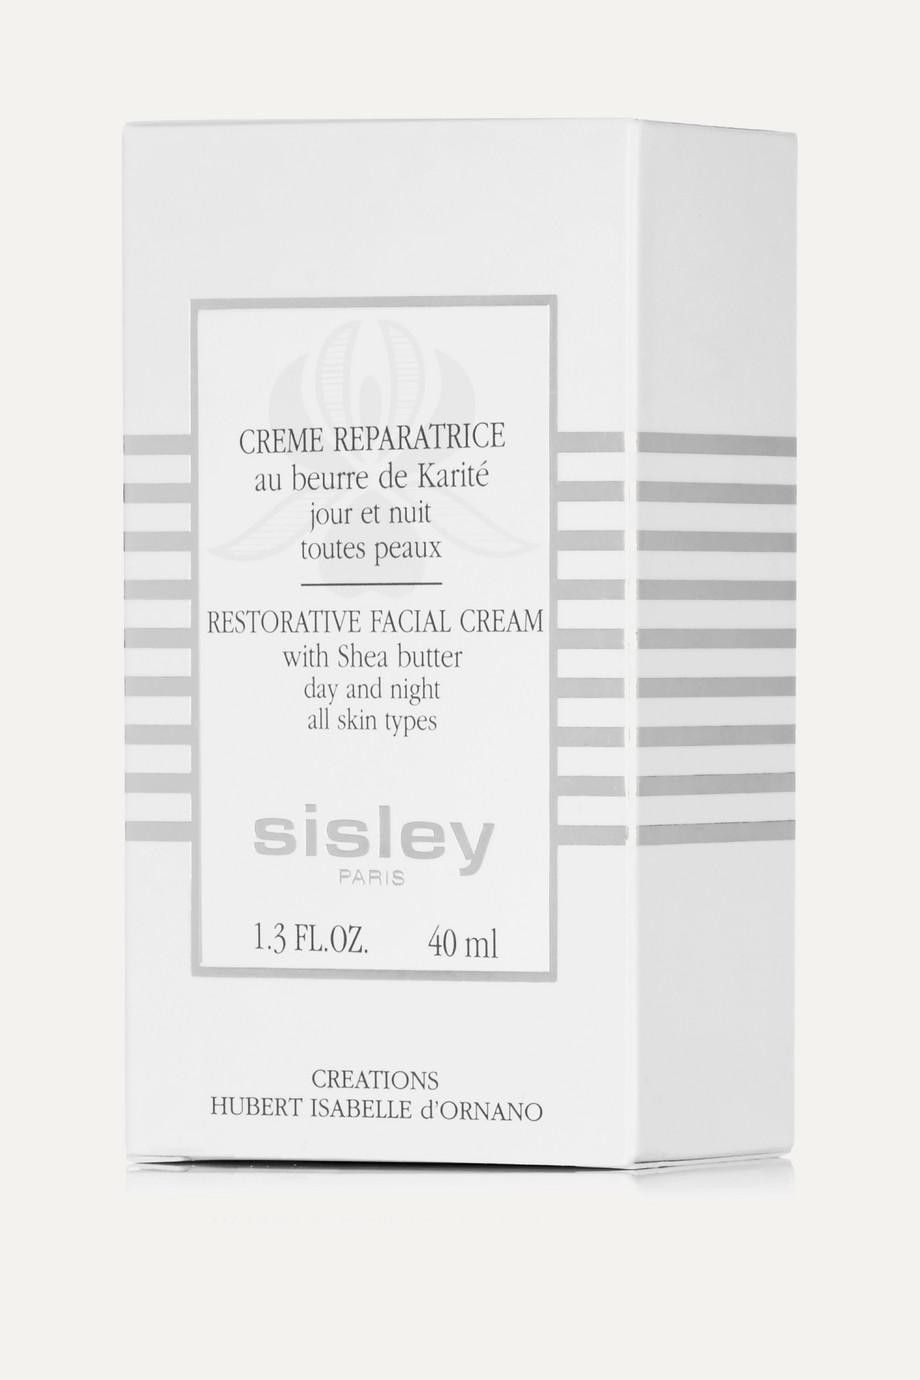 Sisley Restorative Facial Cream with Shea Butter, 40ml